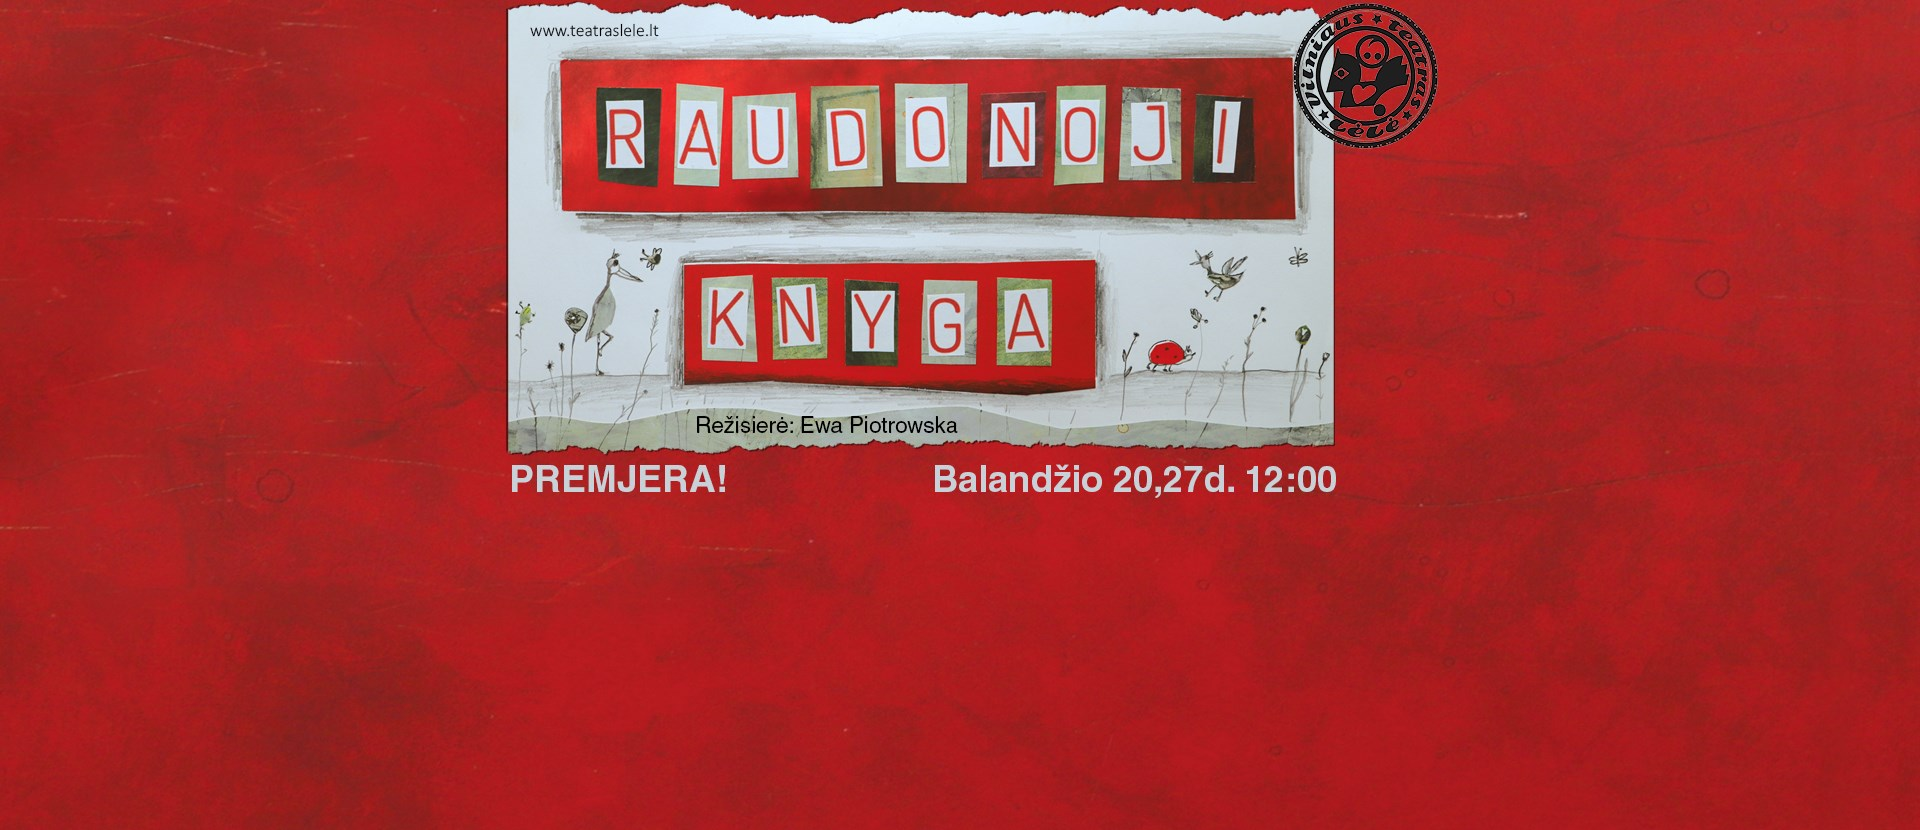 Raudonoji Knyga |Rež. Ewa Piotrowska